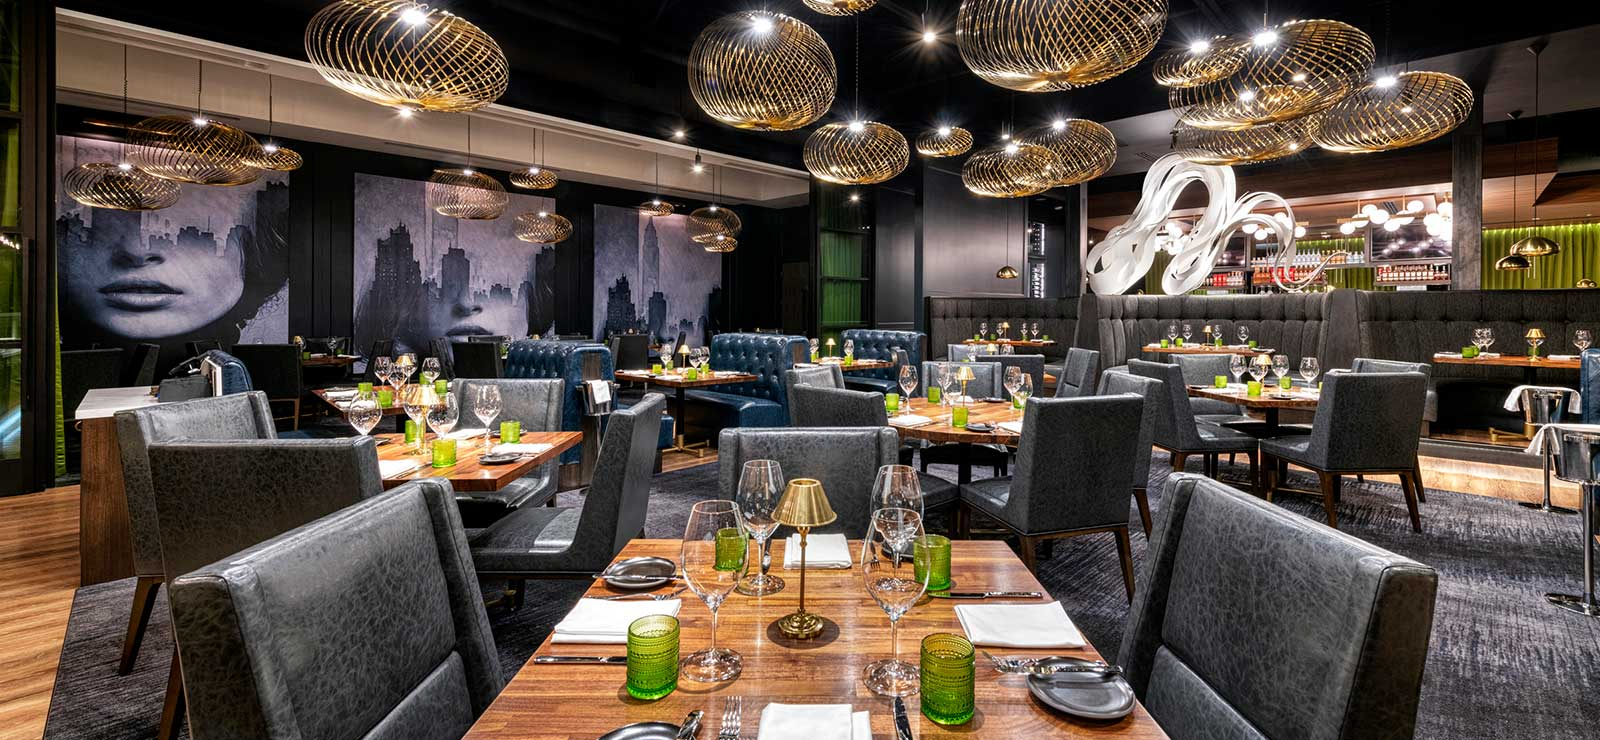 The Americano Restaurant decor